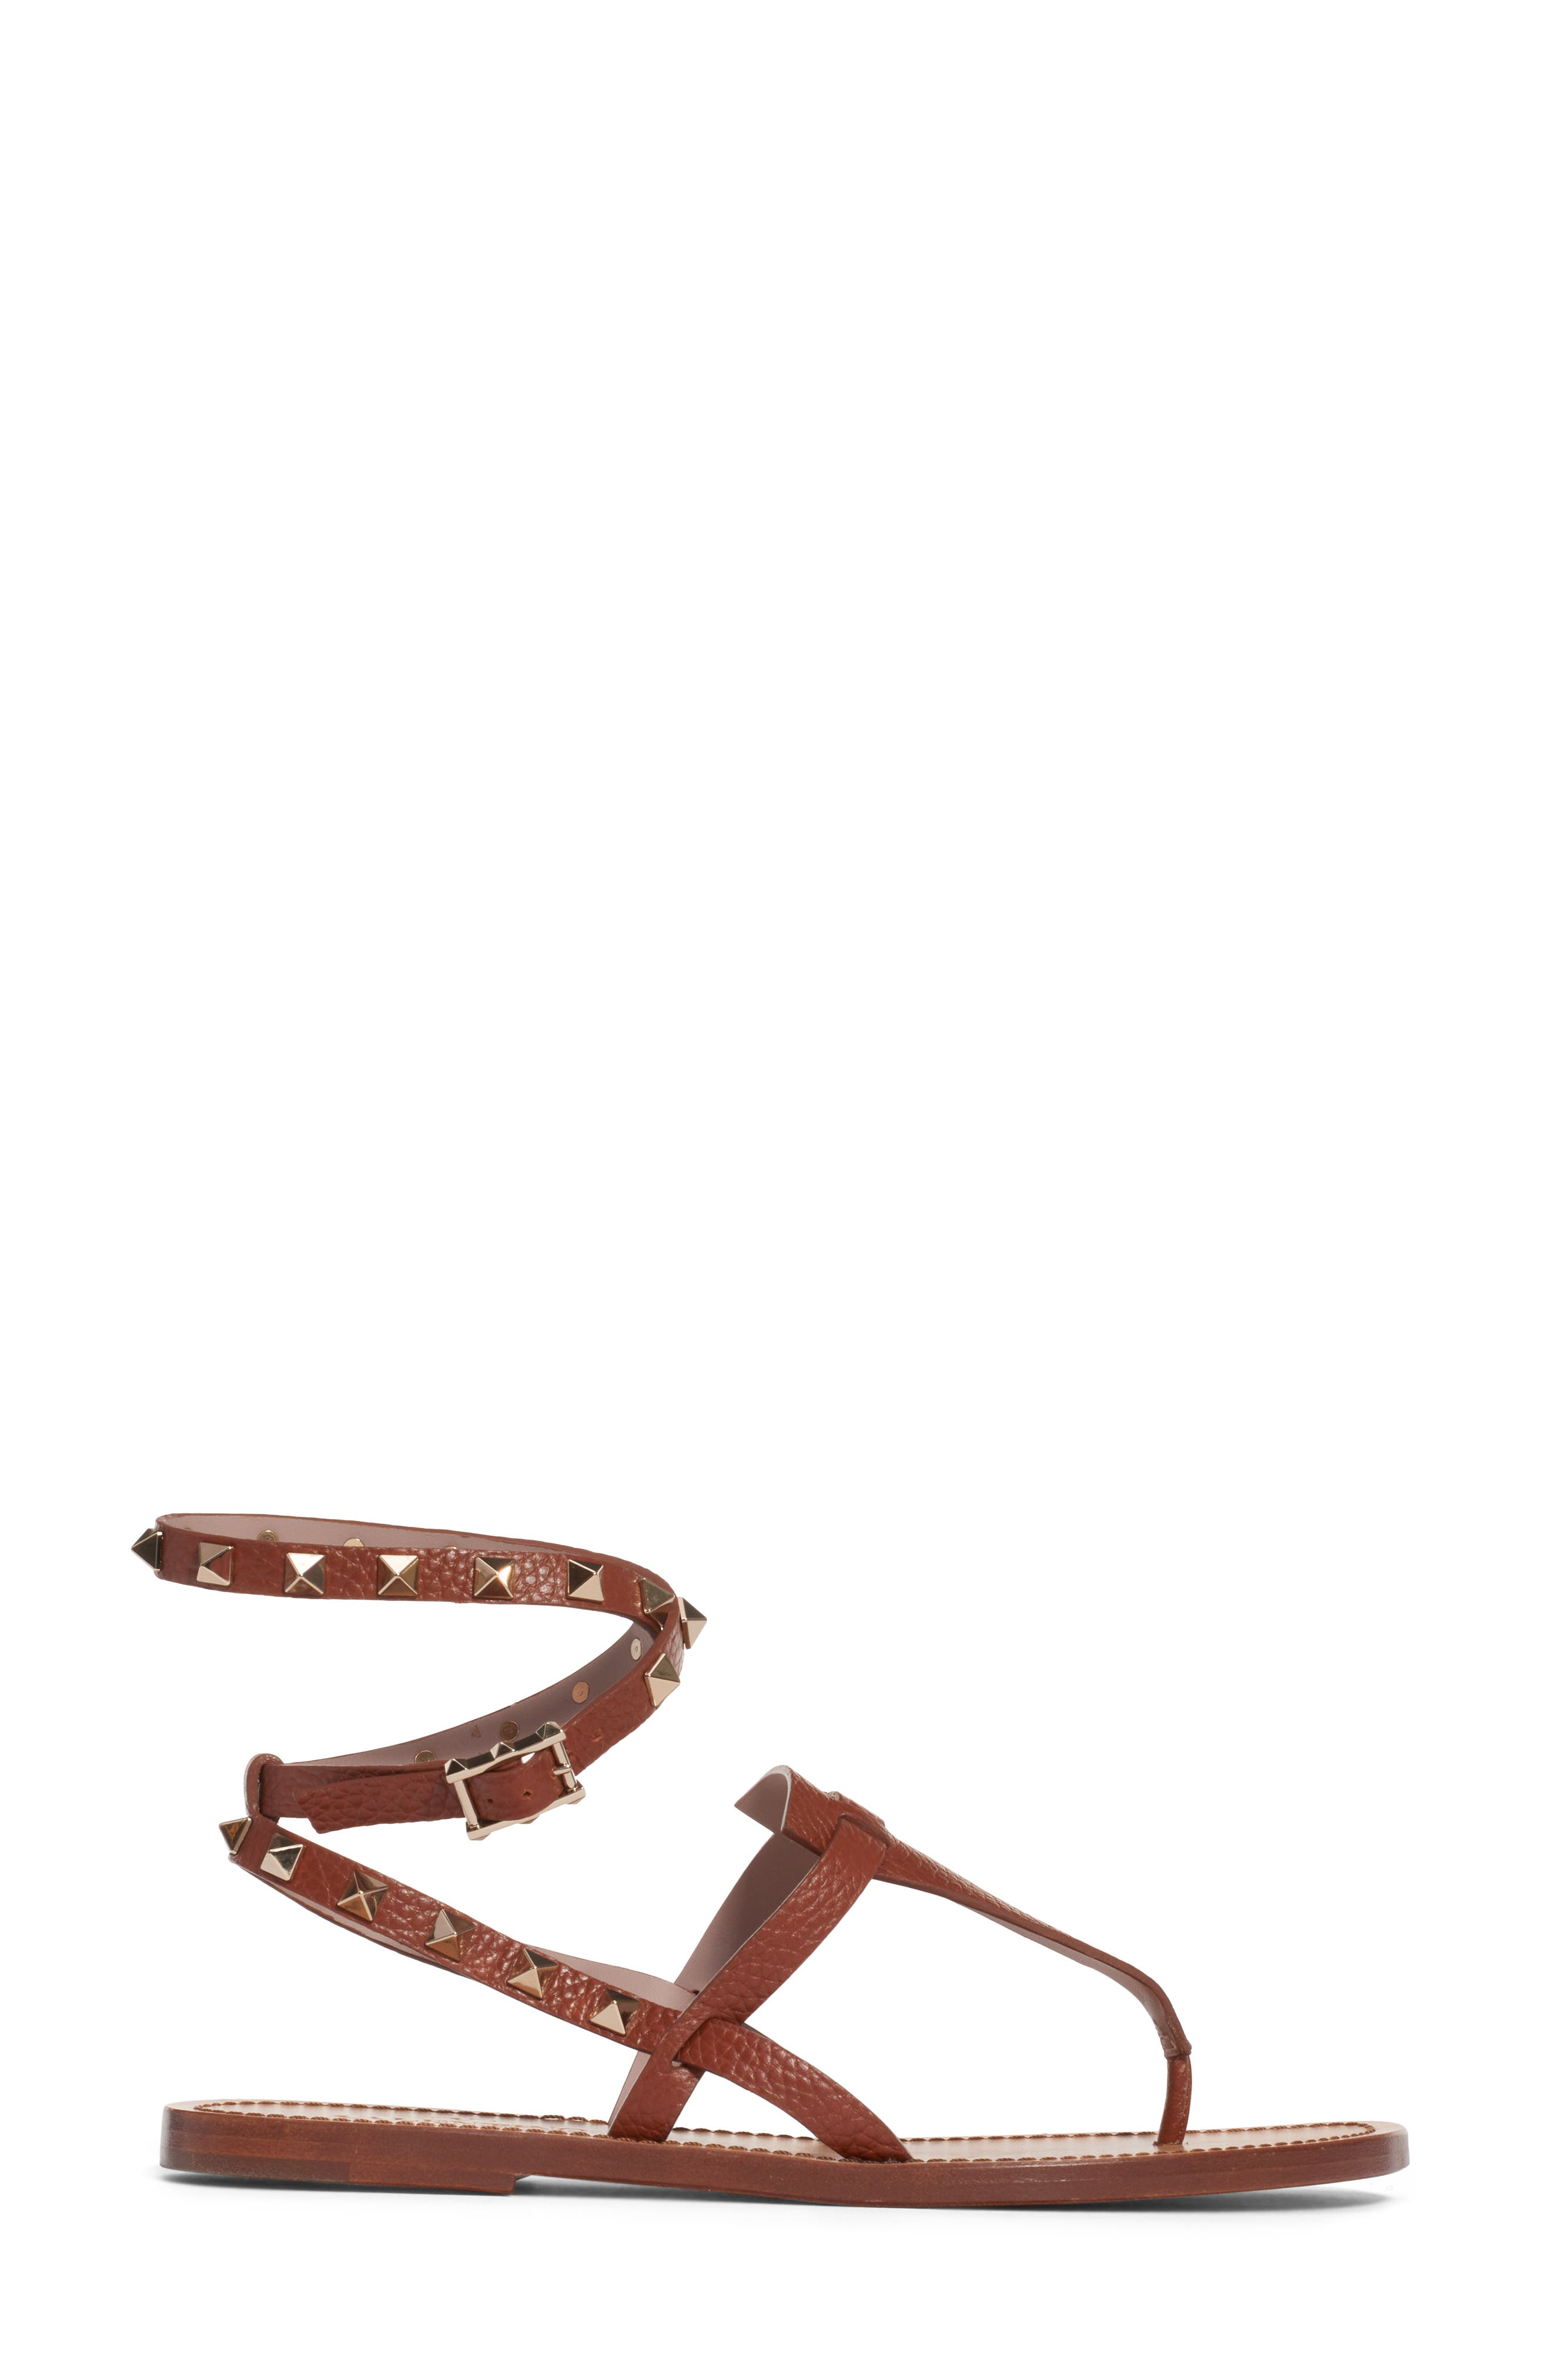 VALENTINO GARAVANI,                             Rockstud Ankle Wrap Sandal,                             Alternate thumbnail 3, color,                             COGNAC